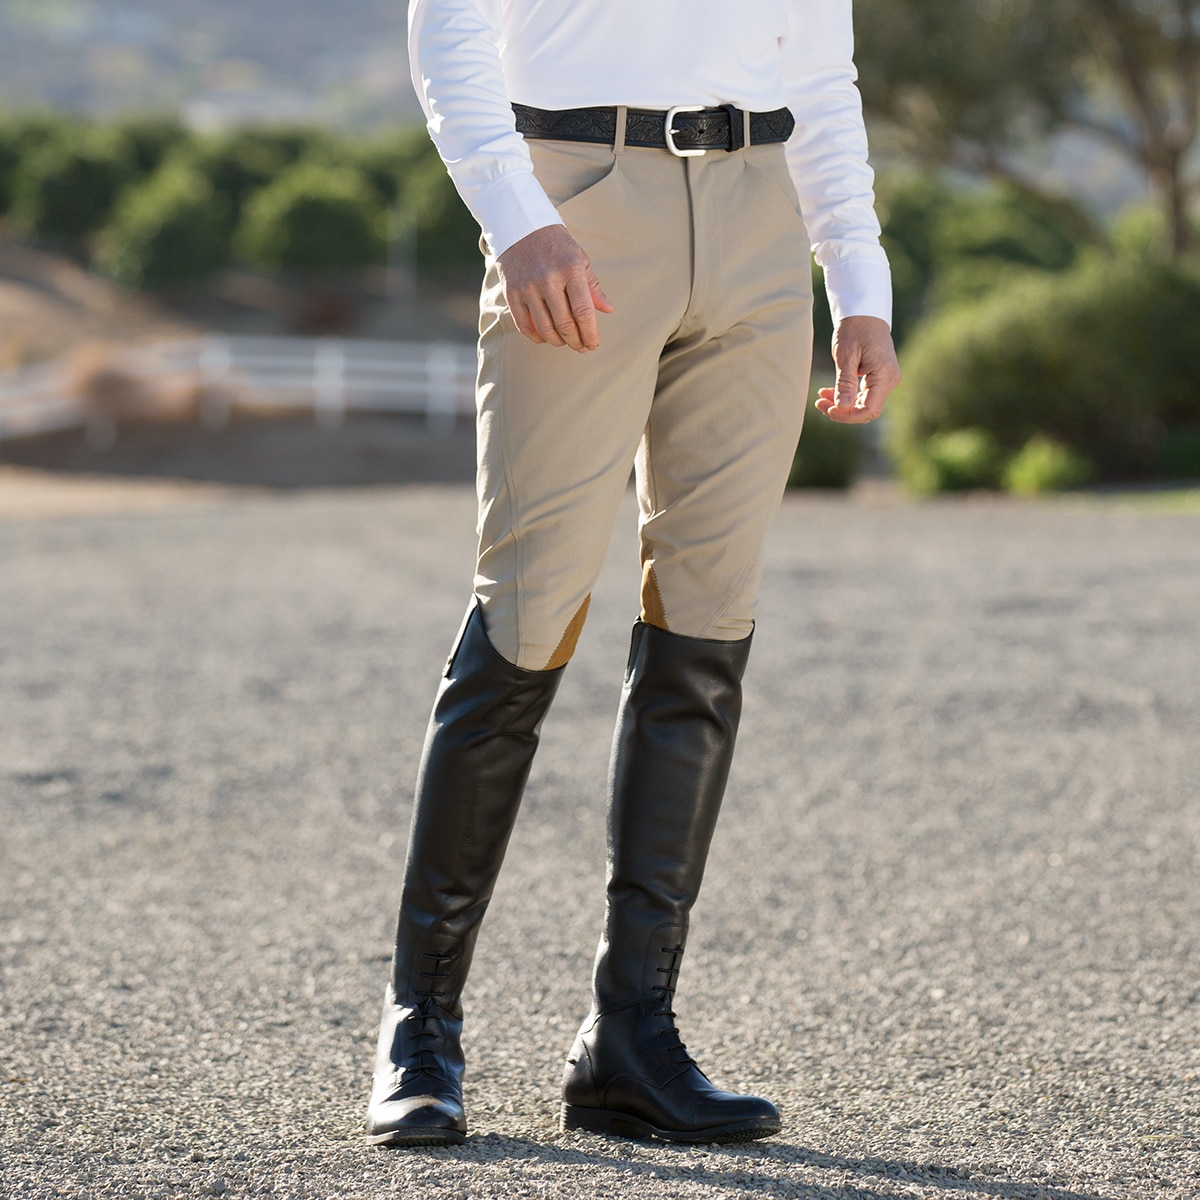 The Tailored Sportsman Men's TS Breeches